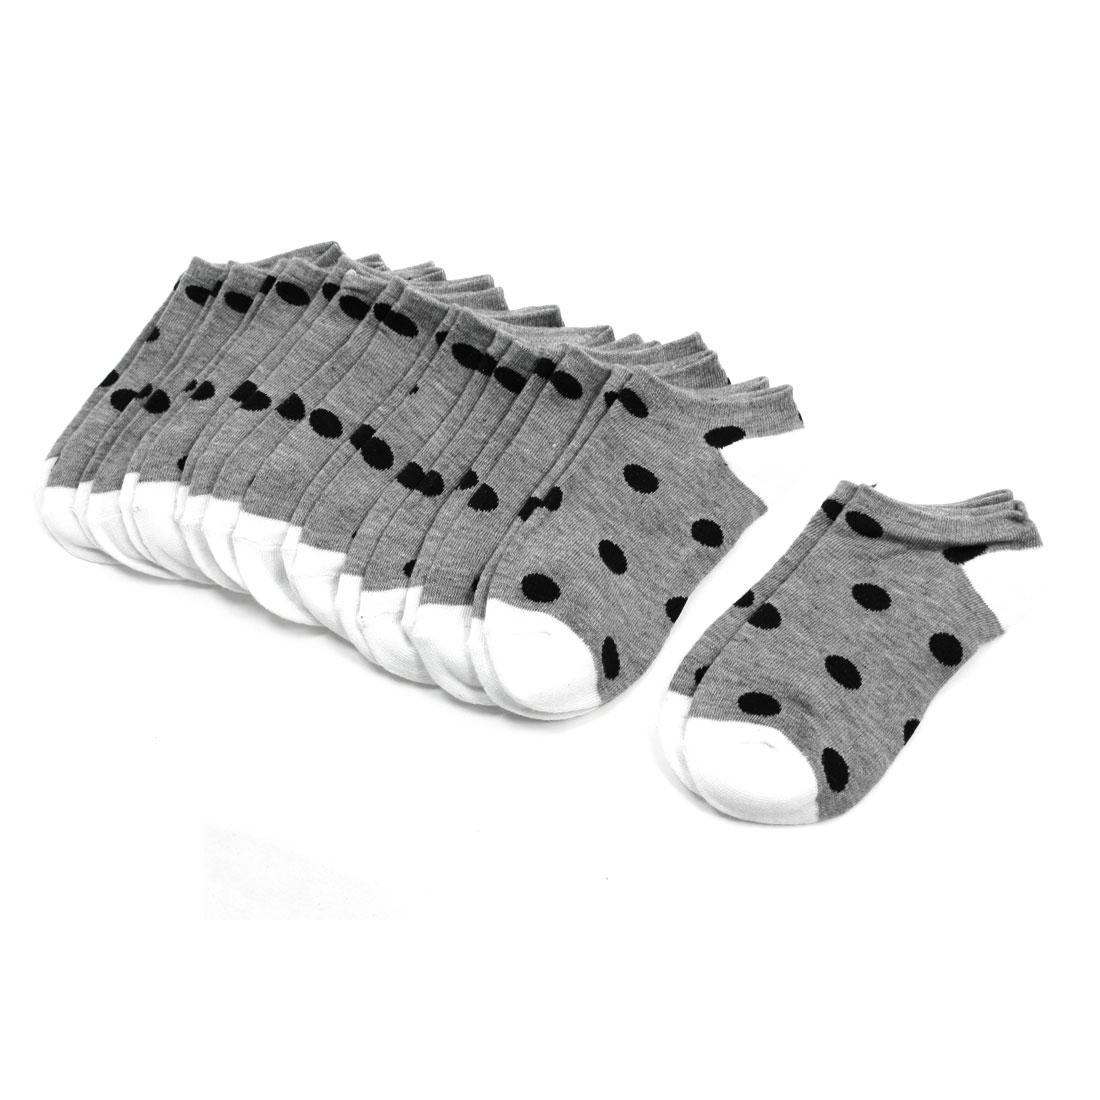 Girls Black Dot Pattern Textured Elastic Footsie Gray Low Cut Socks 10 Pairs